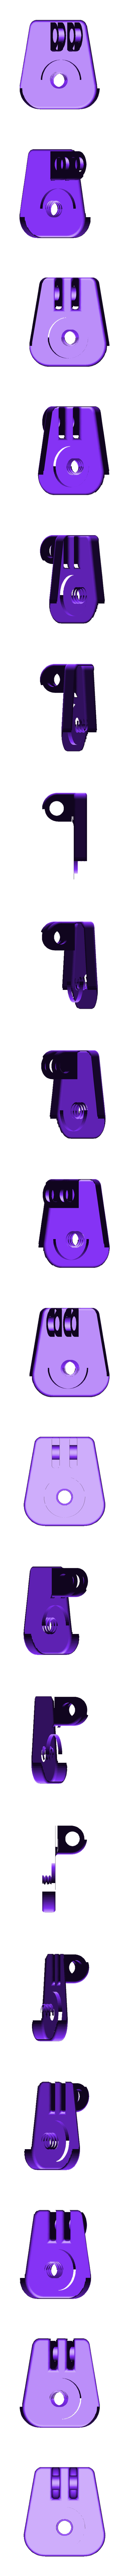 ps4-plate.stl Download free STL file PS4 Display Tripod Mount • Template to 3D print, Adafruit